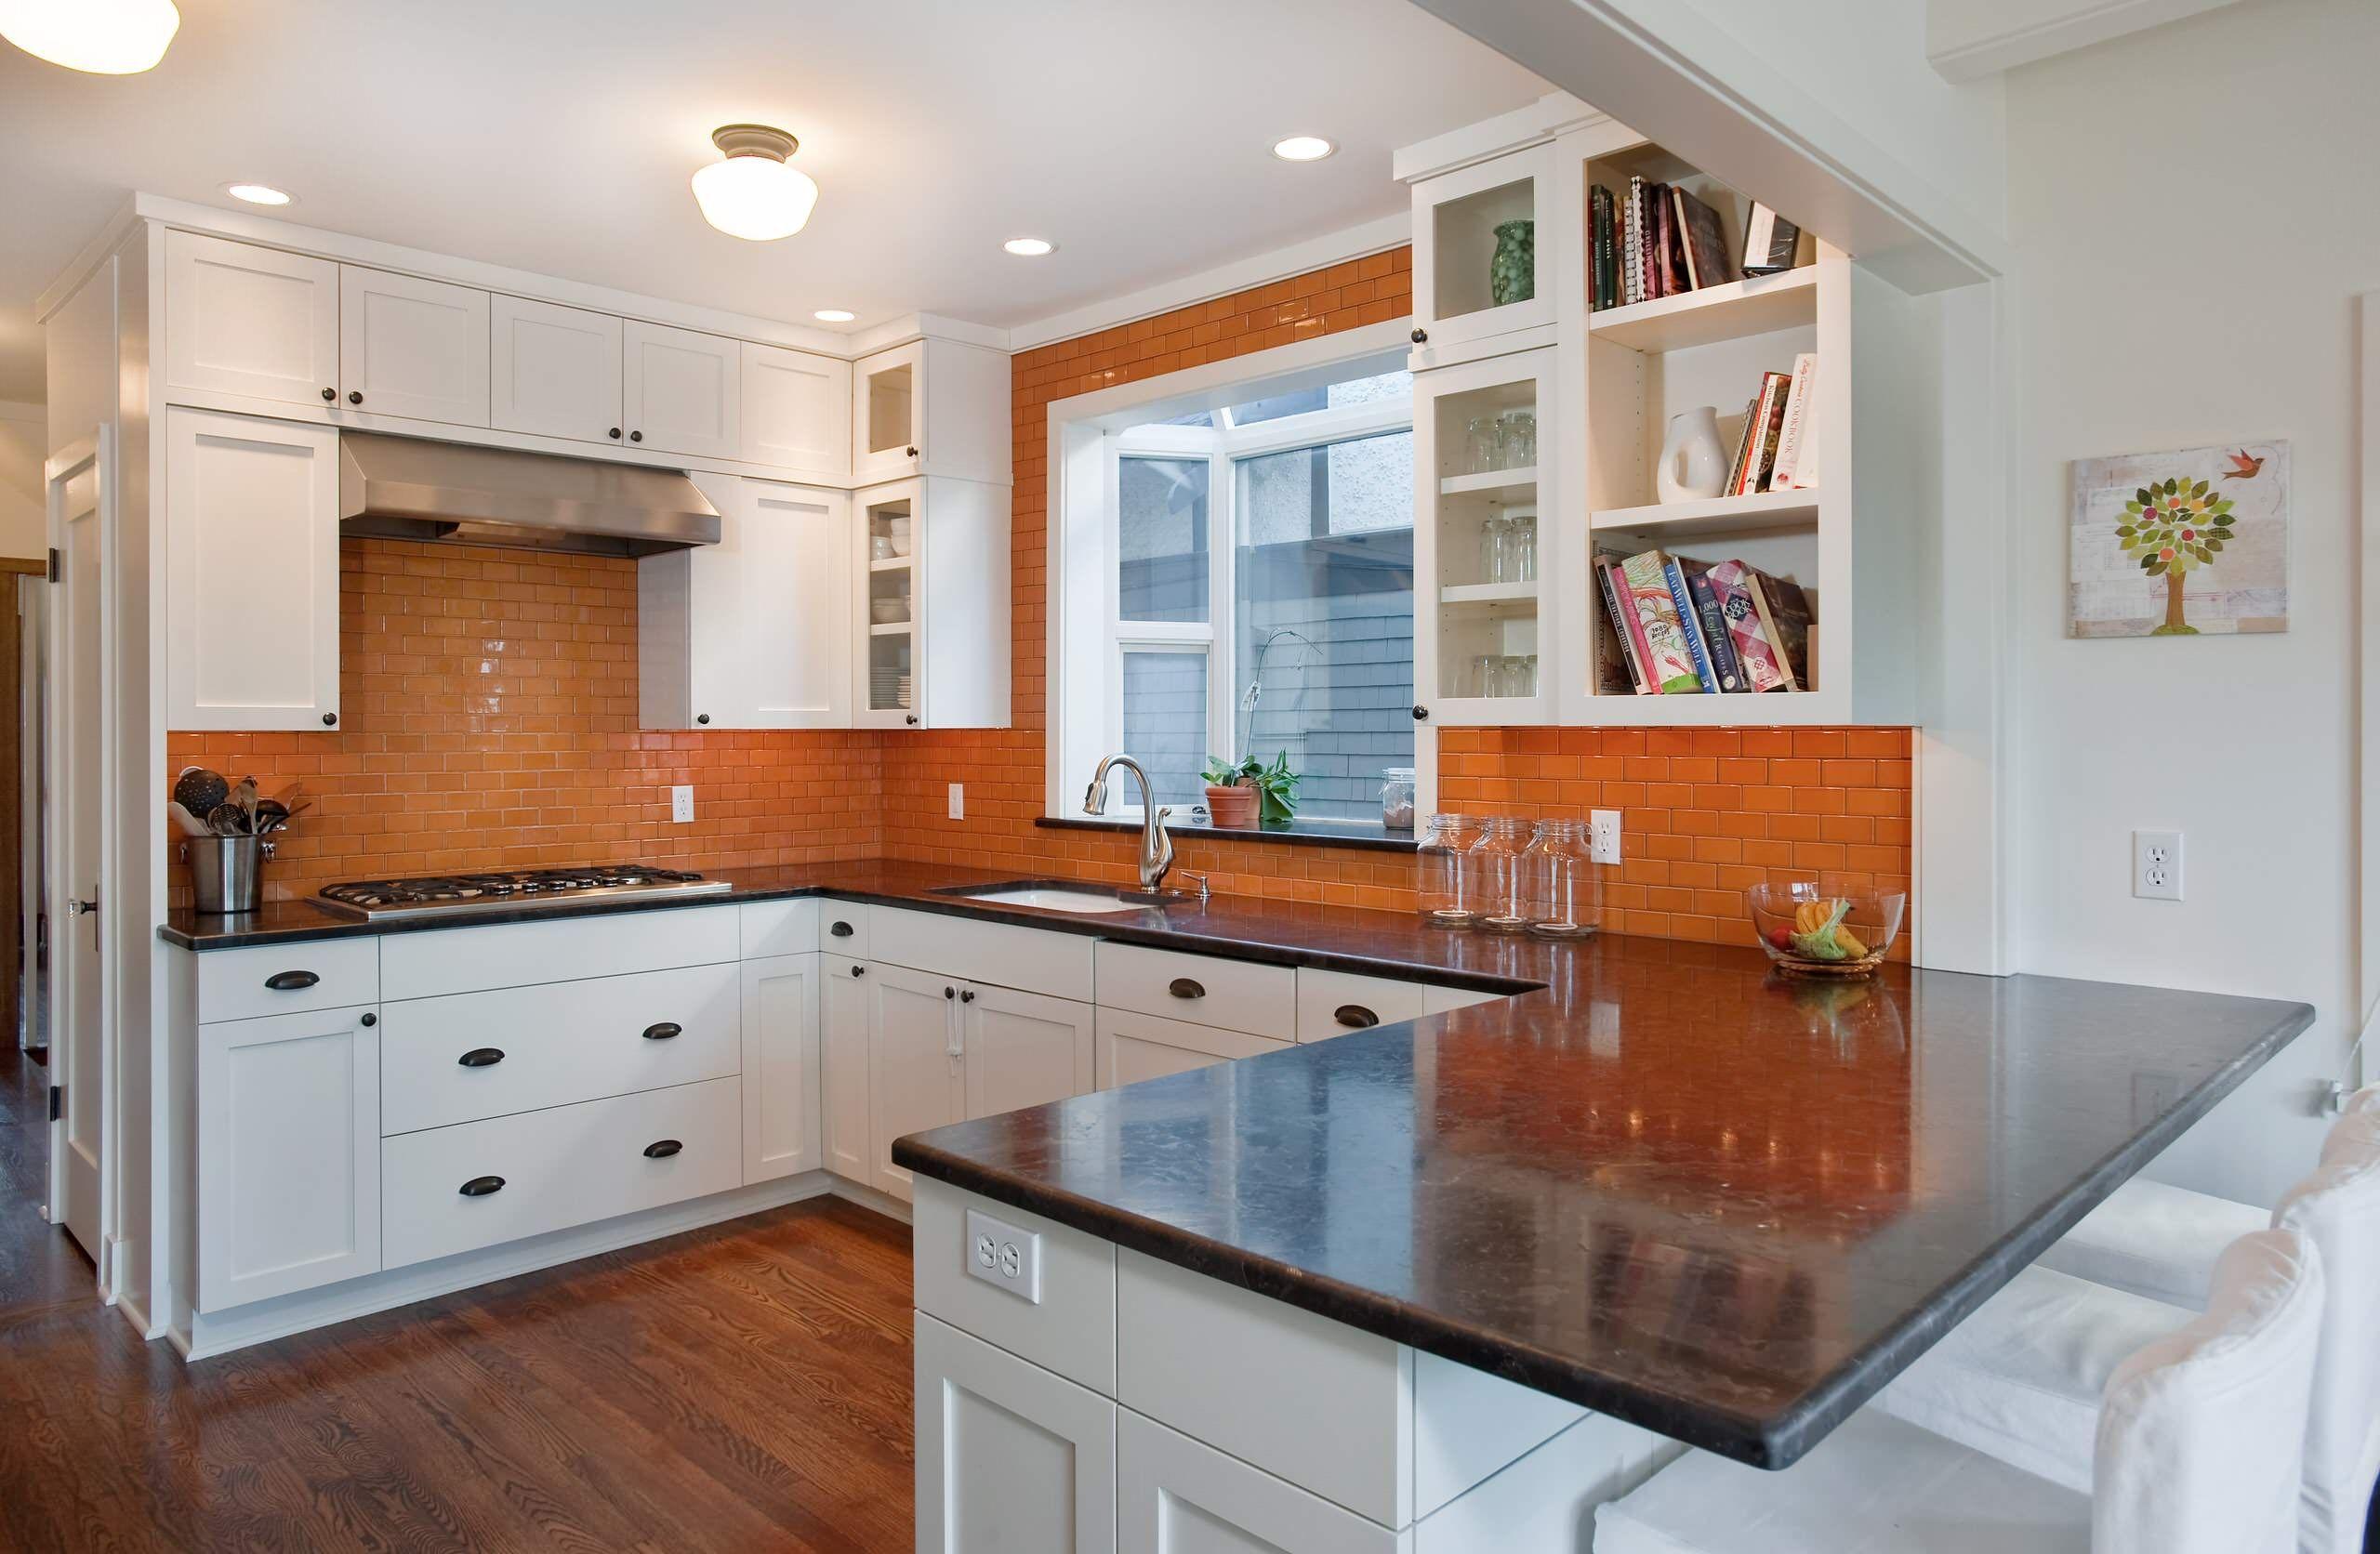 100 Beautiful Kitchens To Inspire Your Kitchen Makeover Moderne Kuche Kuchendekoration Kuchendesign